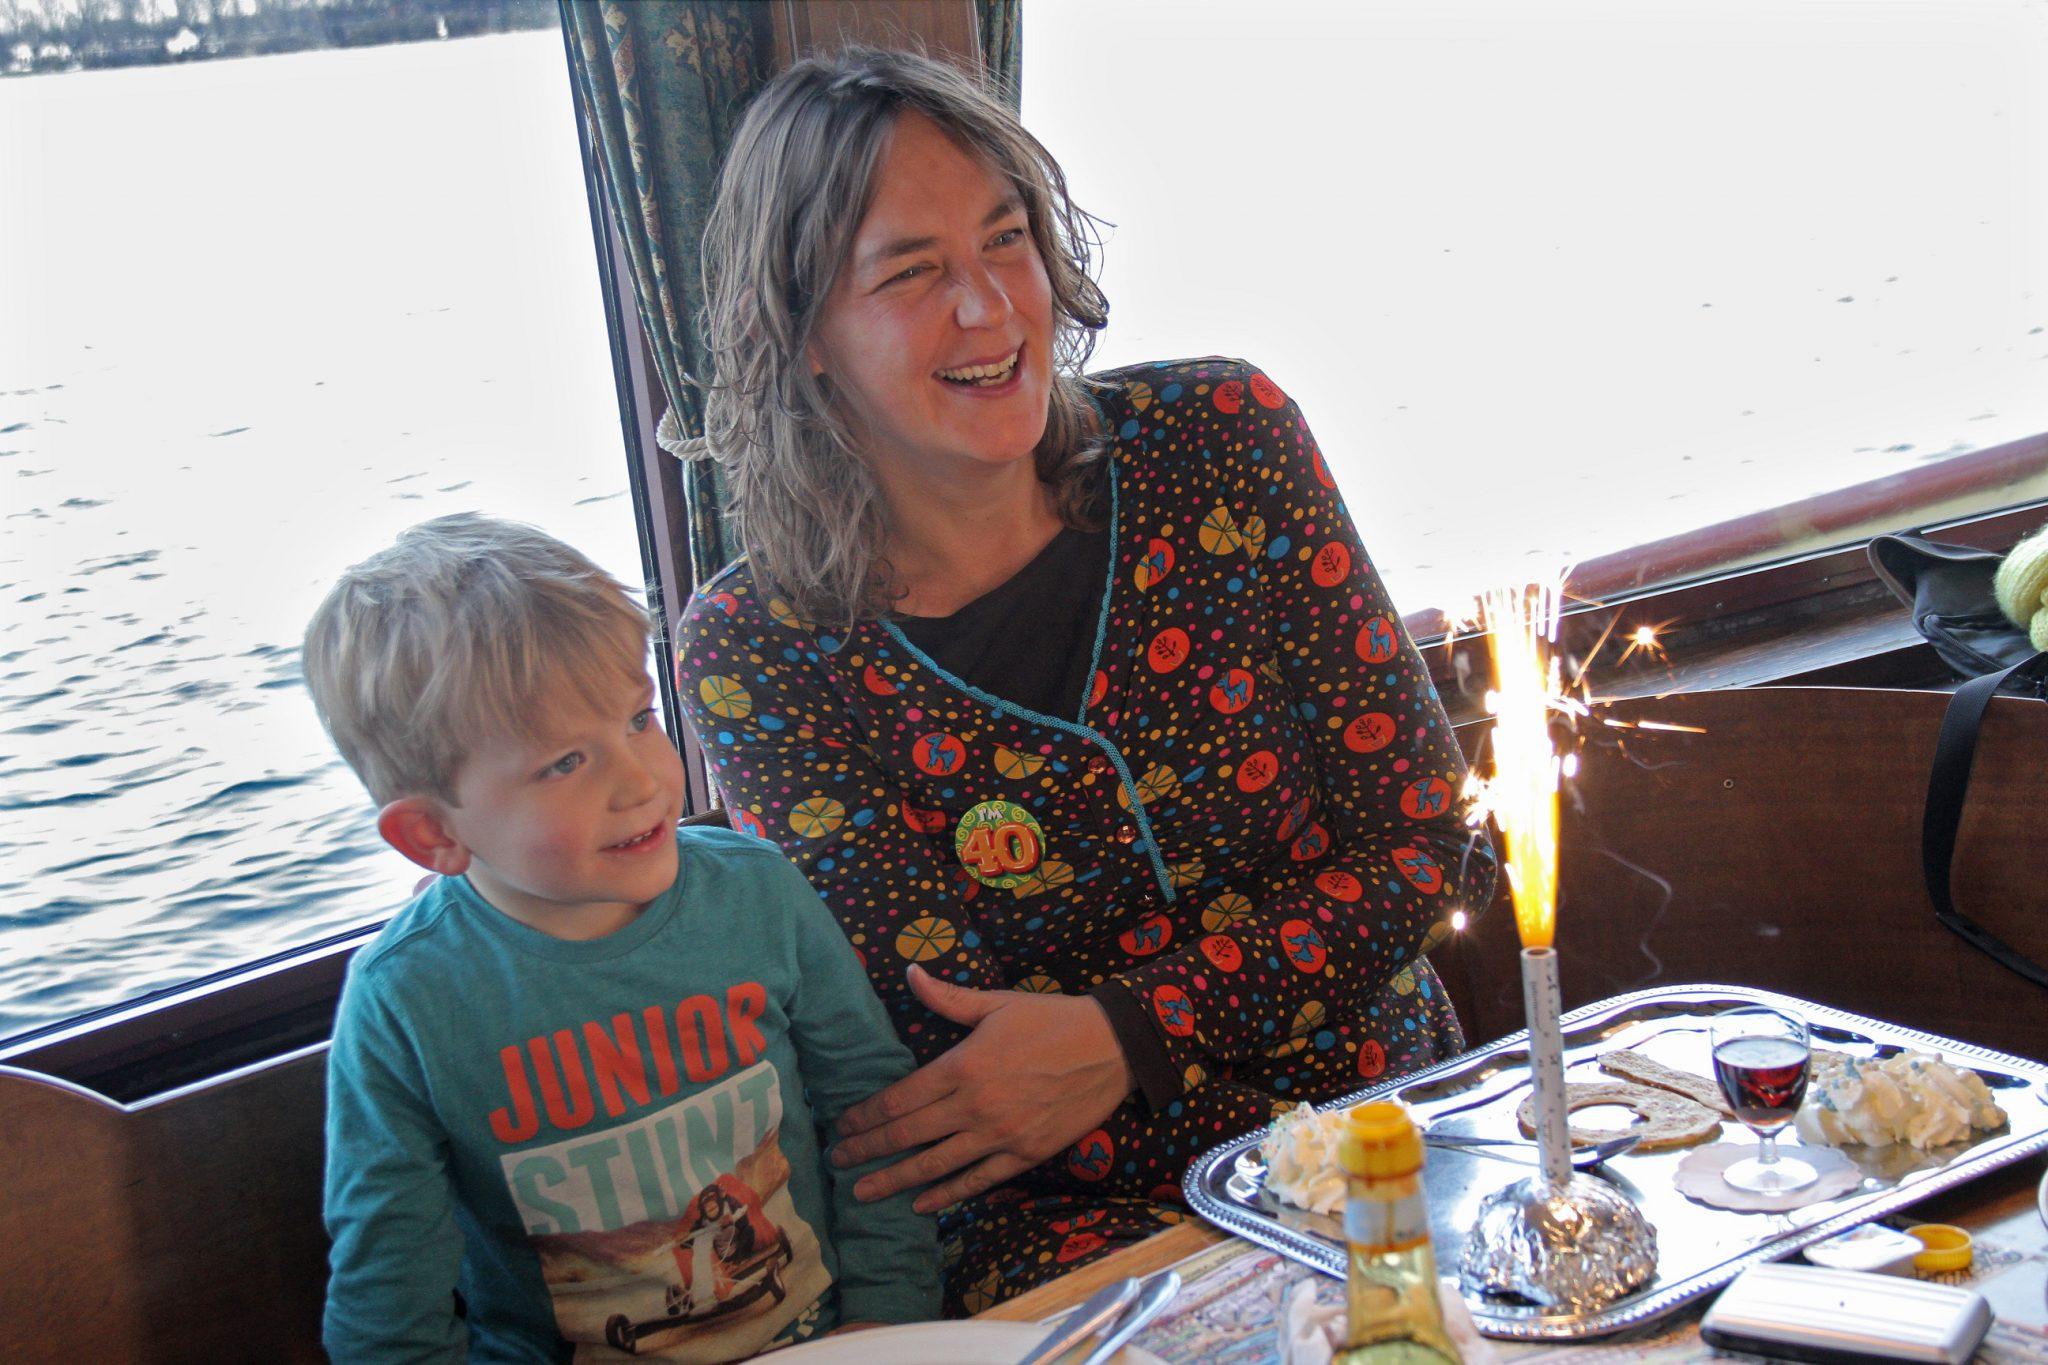 Moederdagbrunch pannenkoekenboot rotterdam for Kerstbrunch rotterdam